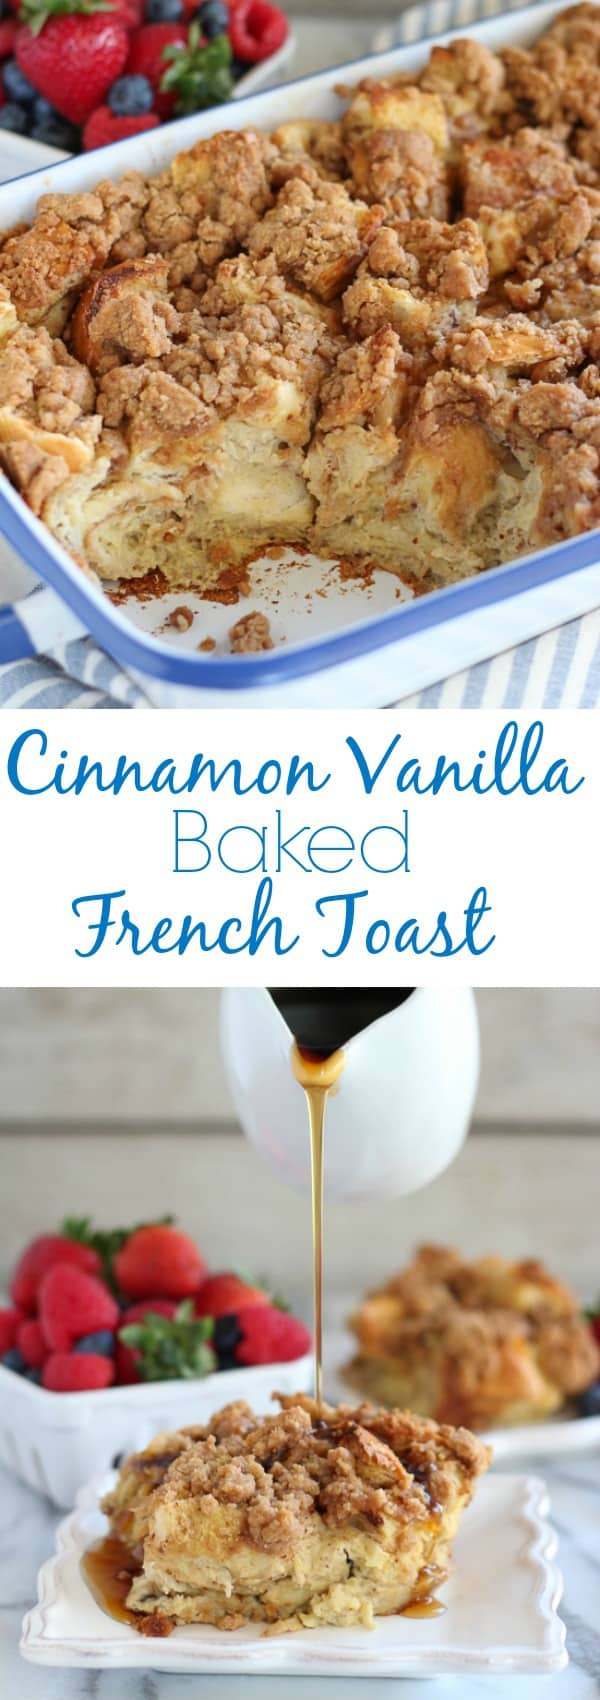 Cinnamon Vanilla Baked French Toast - An easy make-ahead french toast ...